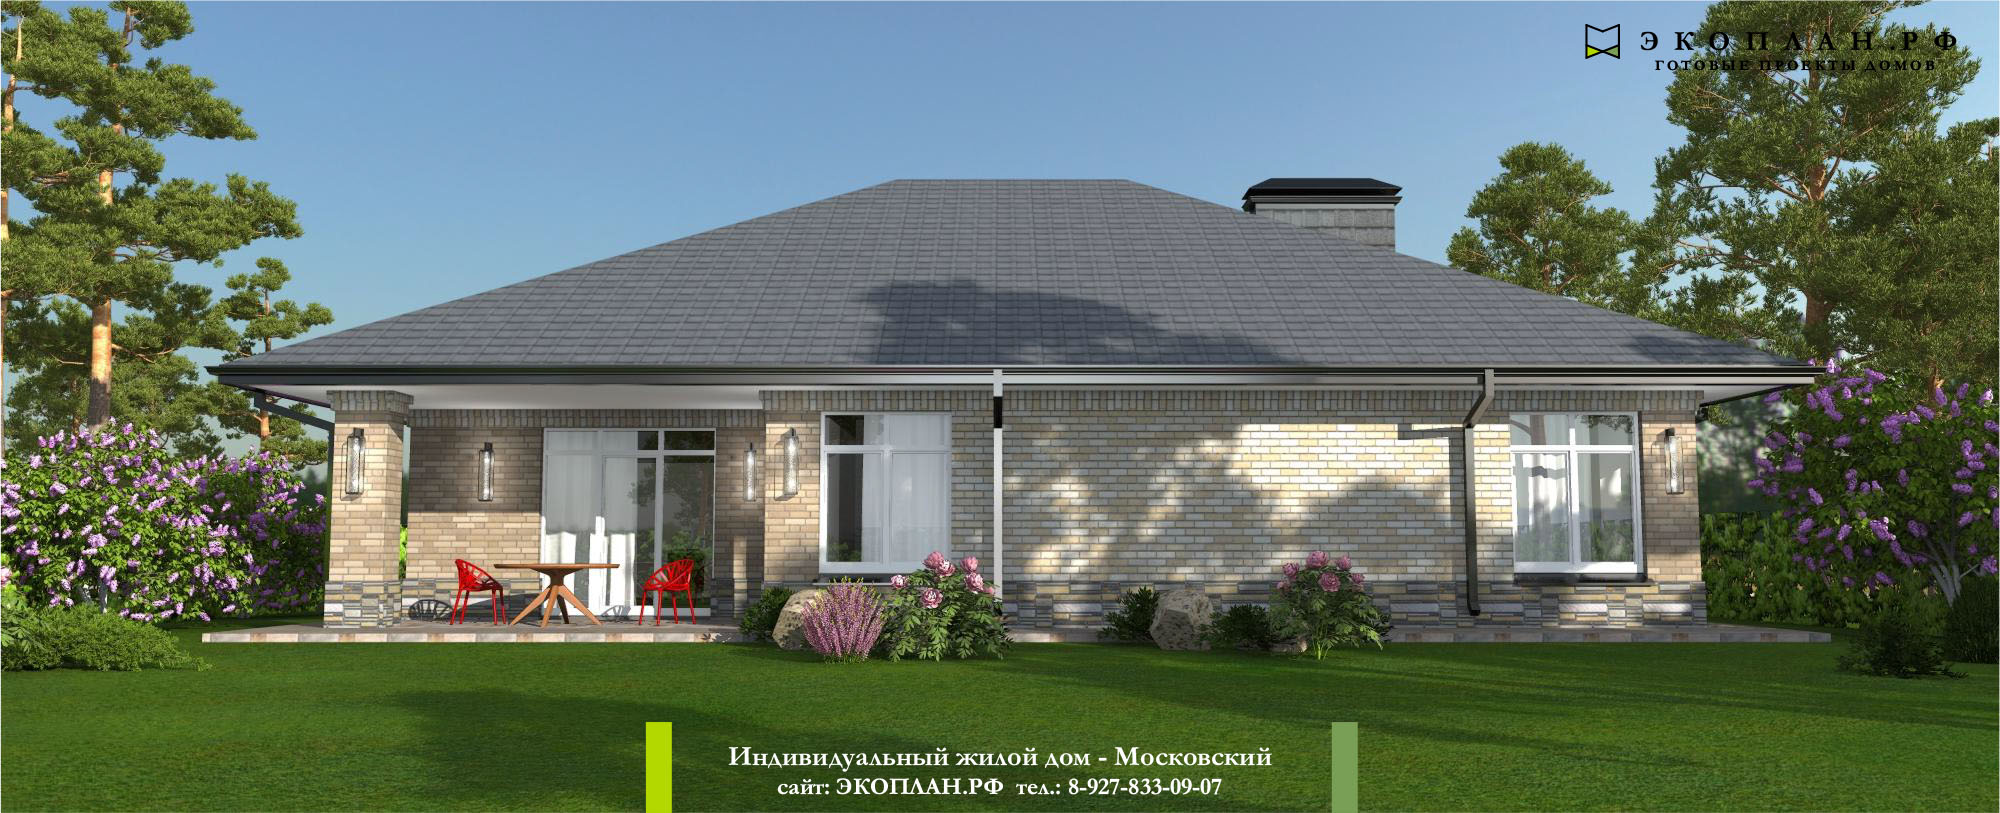 Московский проект дома - Экоплан фасад